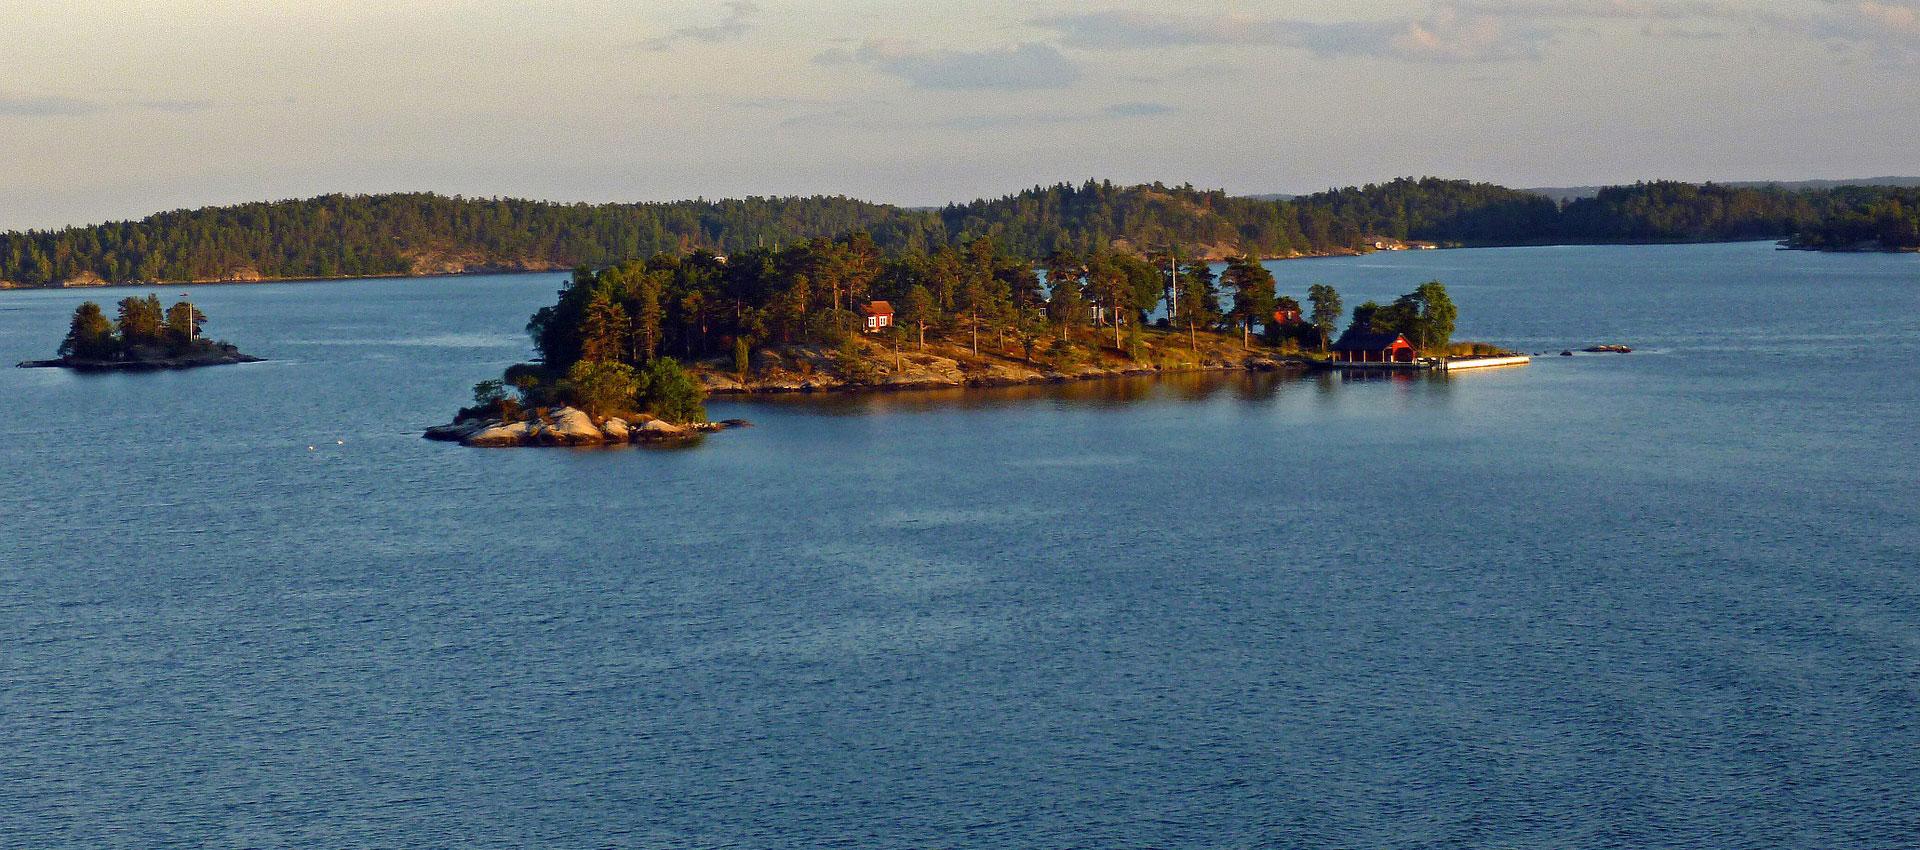 Schären in Schweden